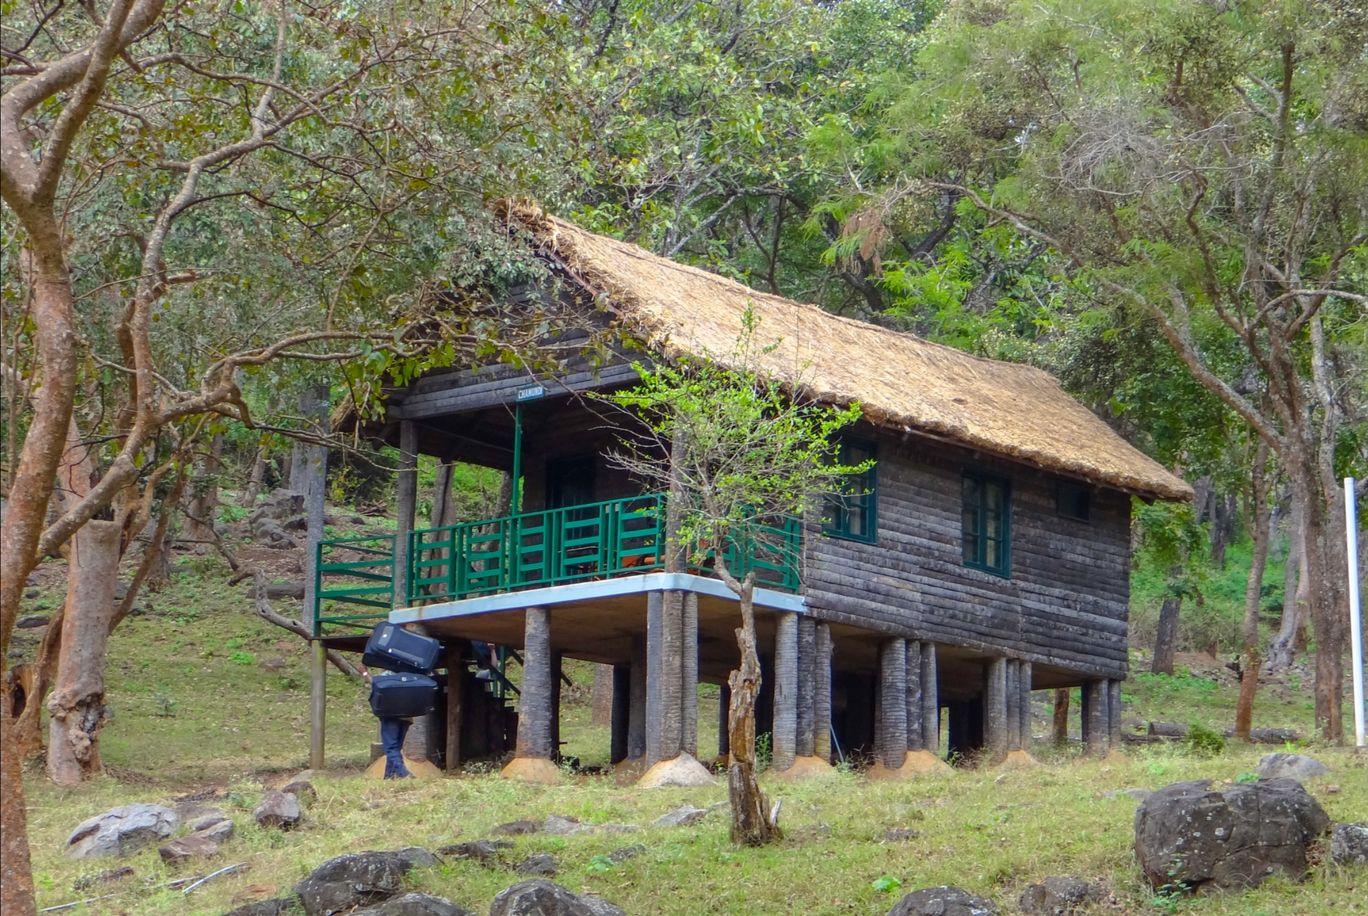 Photo of K Gudi Wilderness Camp By Krutarth Vashi